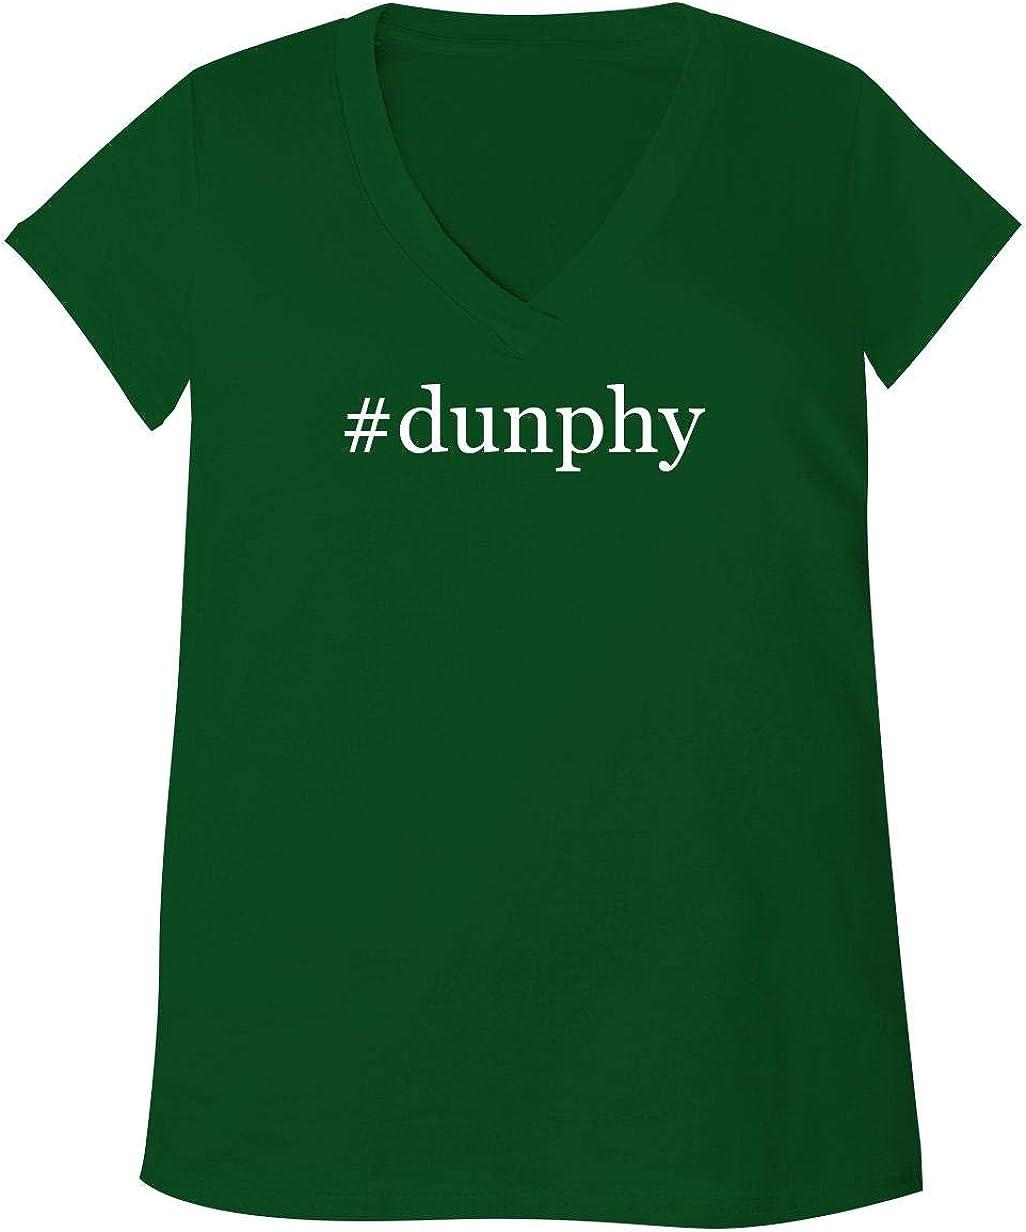 #Dunphy - Adult Bella + Canvas B6035 Women'S V-Neck T-Shirt